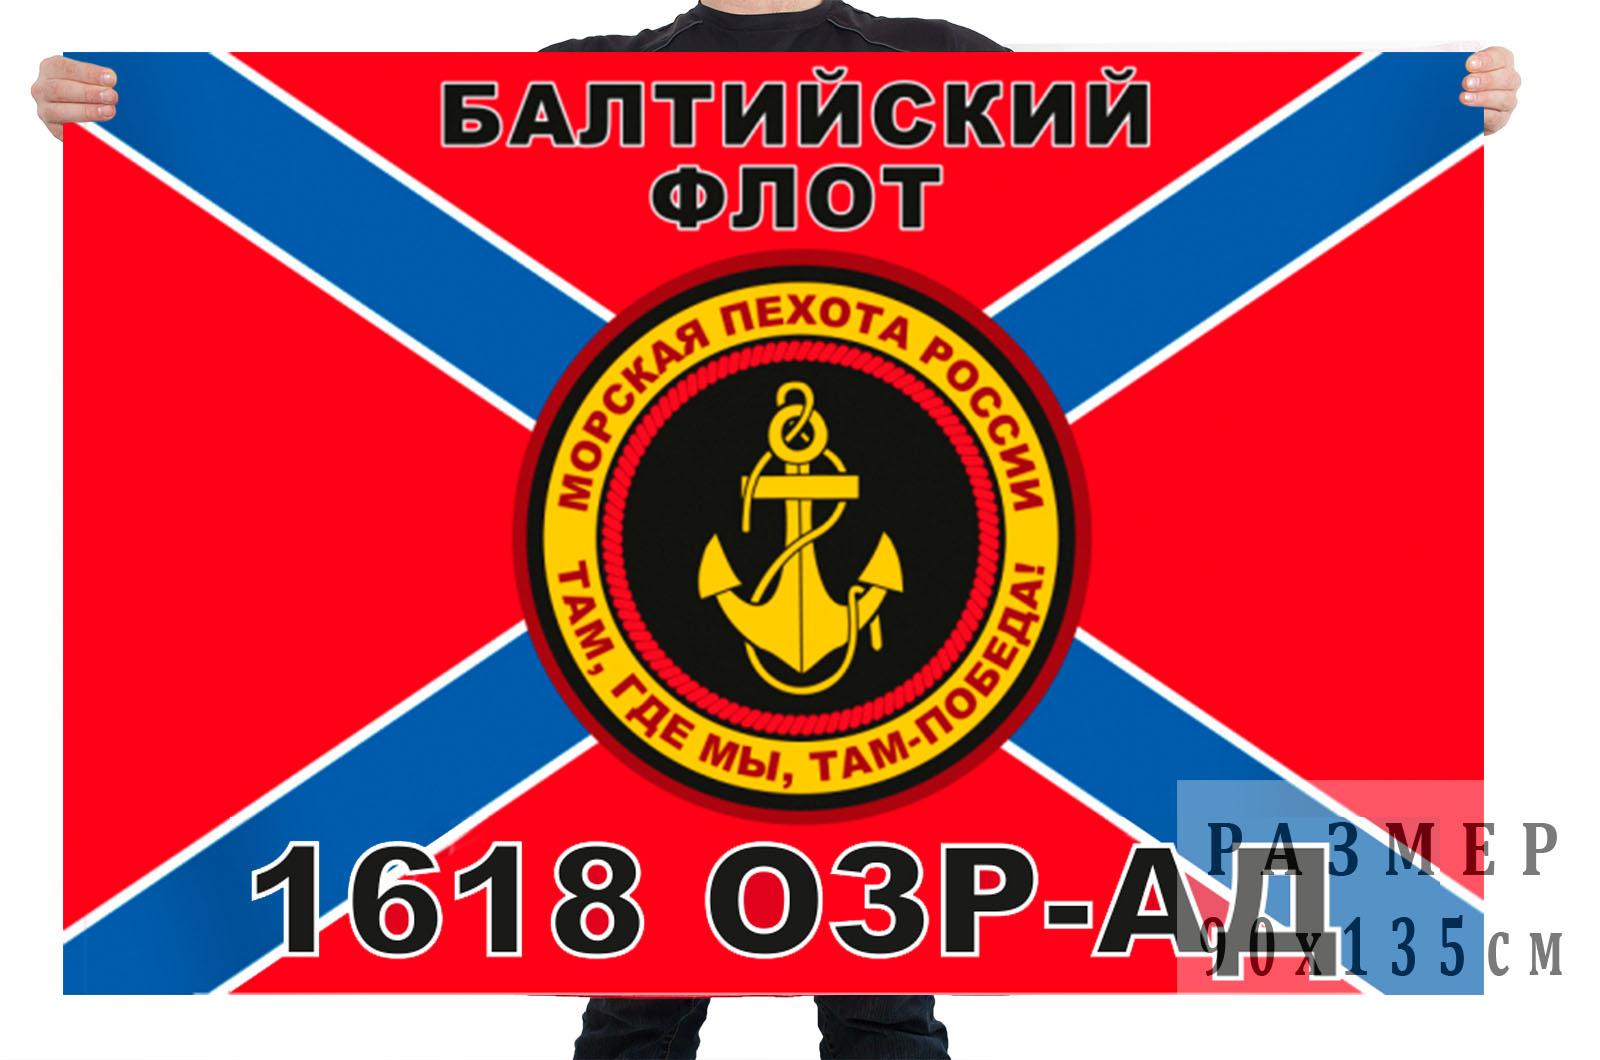 Флаг Морской пехоты 1618 ОЗР-АД